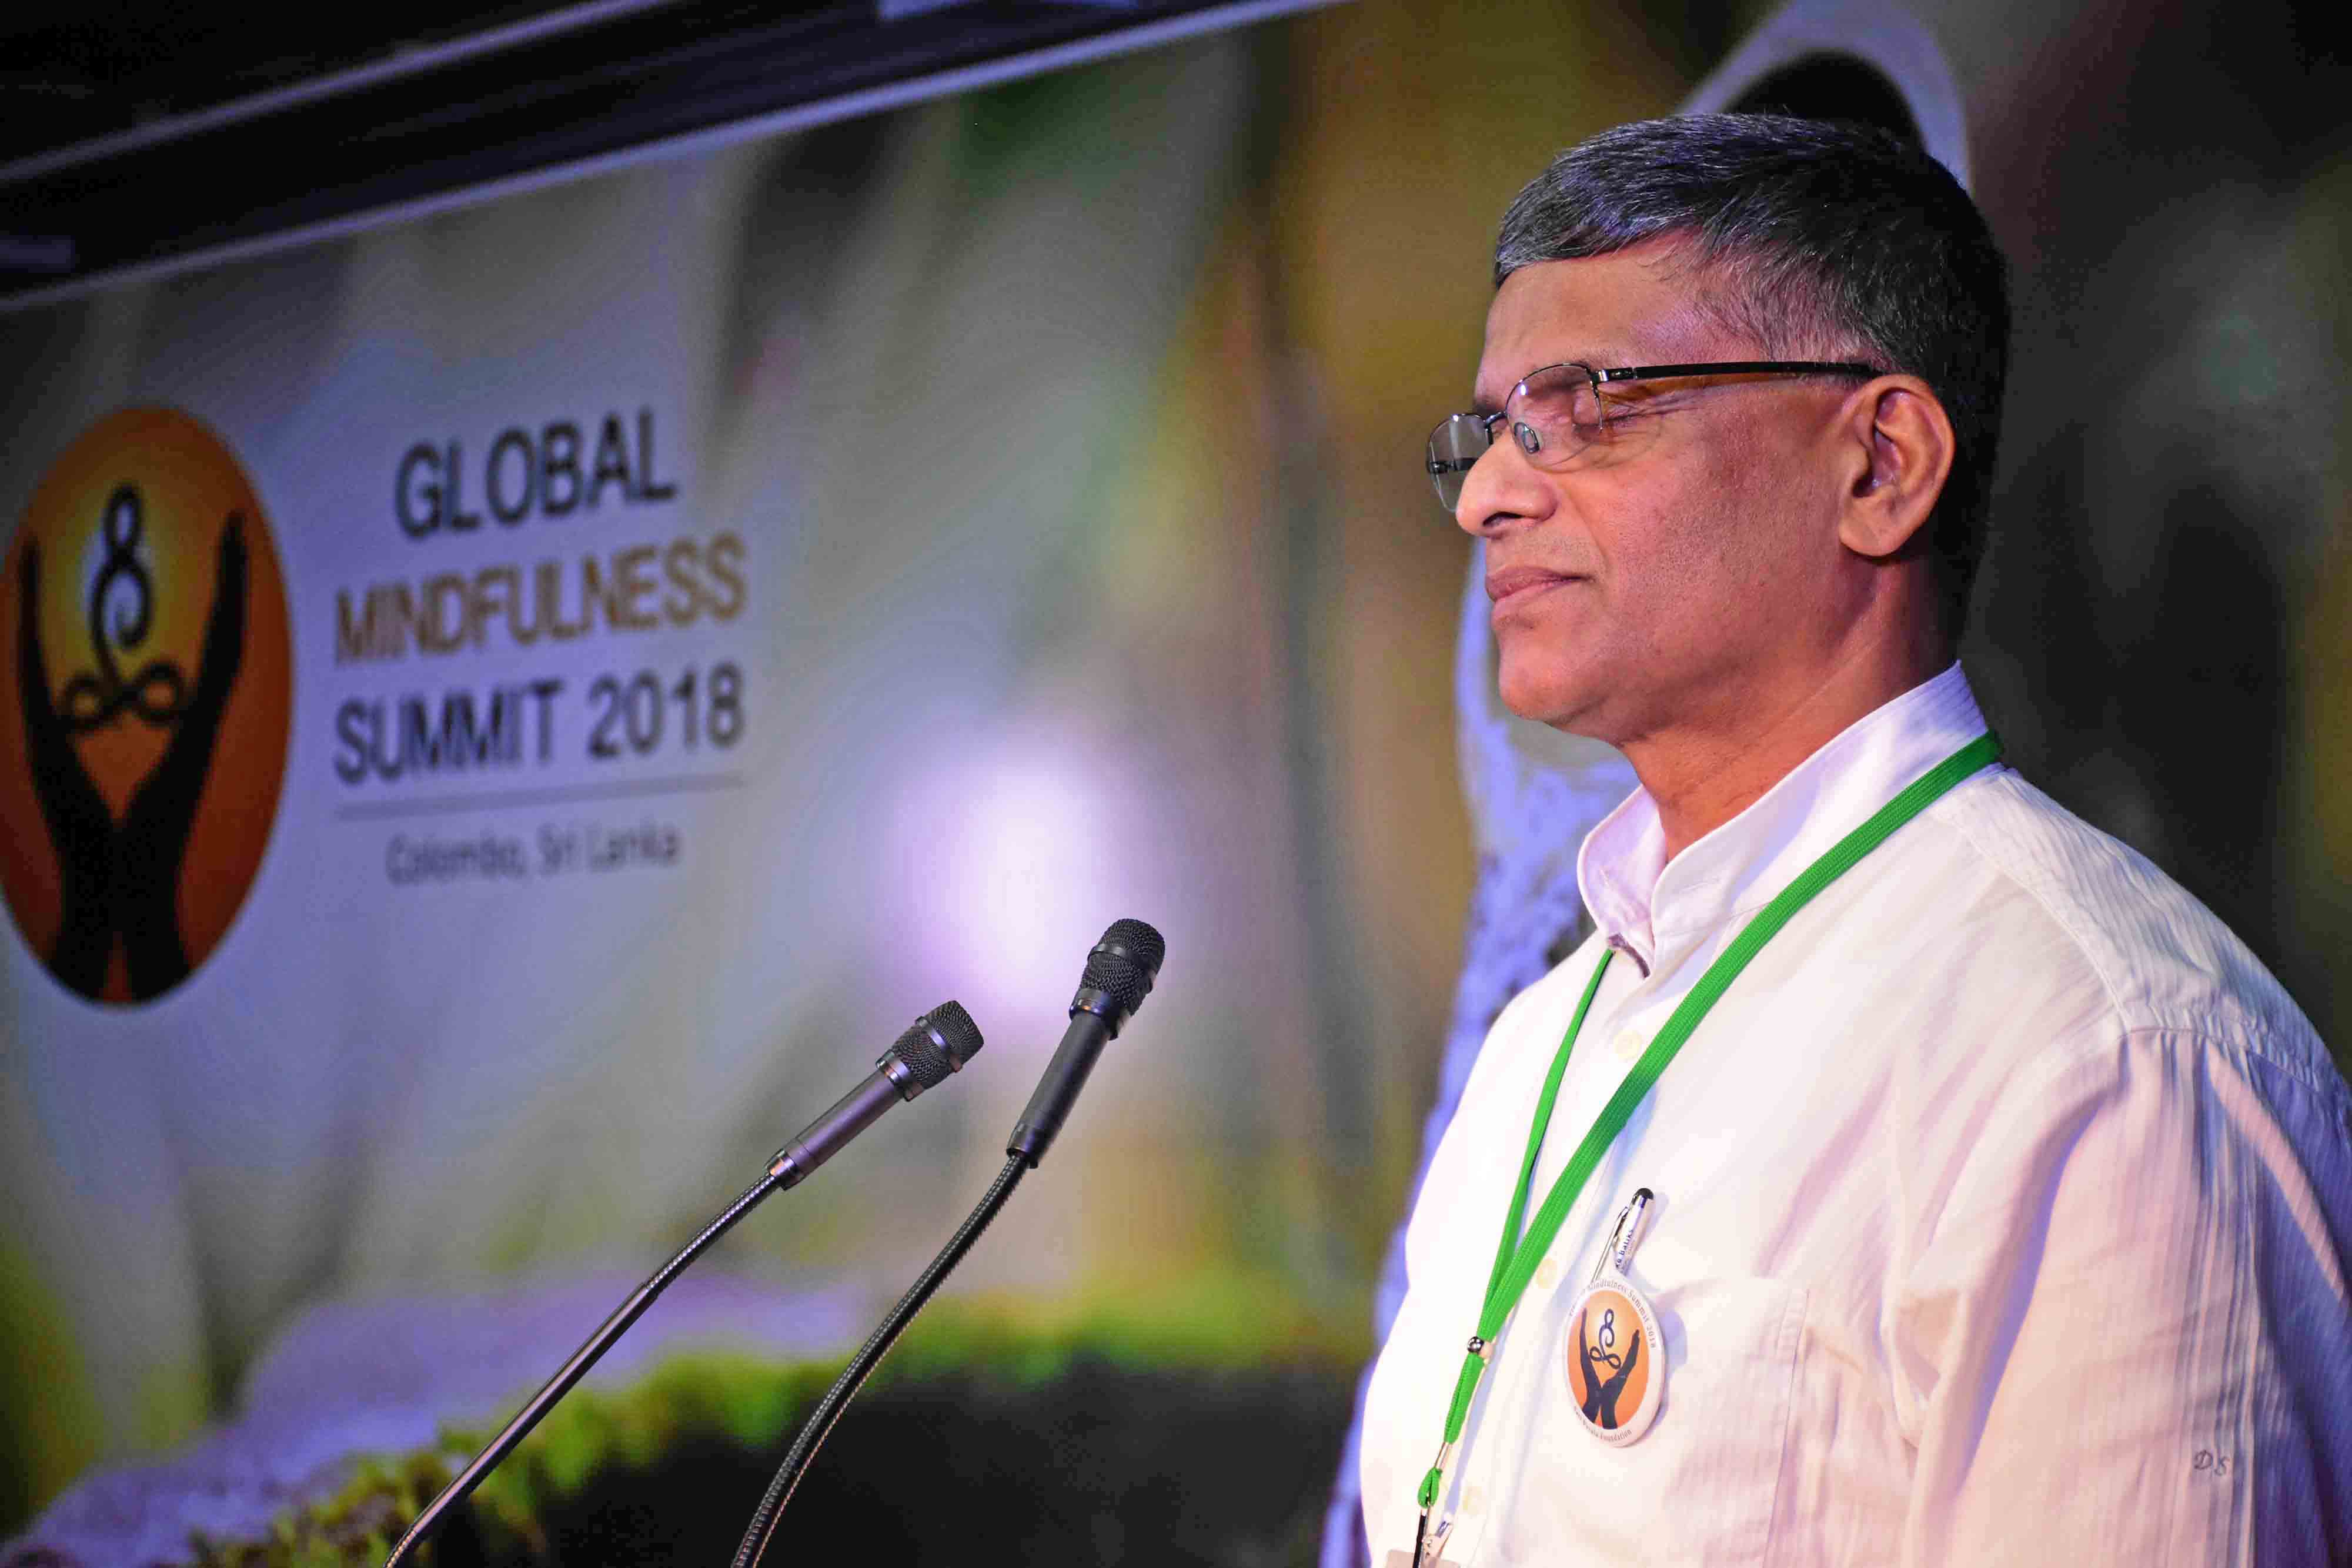 Global Mindfulness Summit 2018 - Day2 (62)